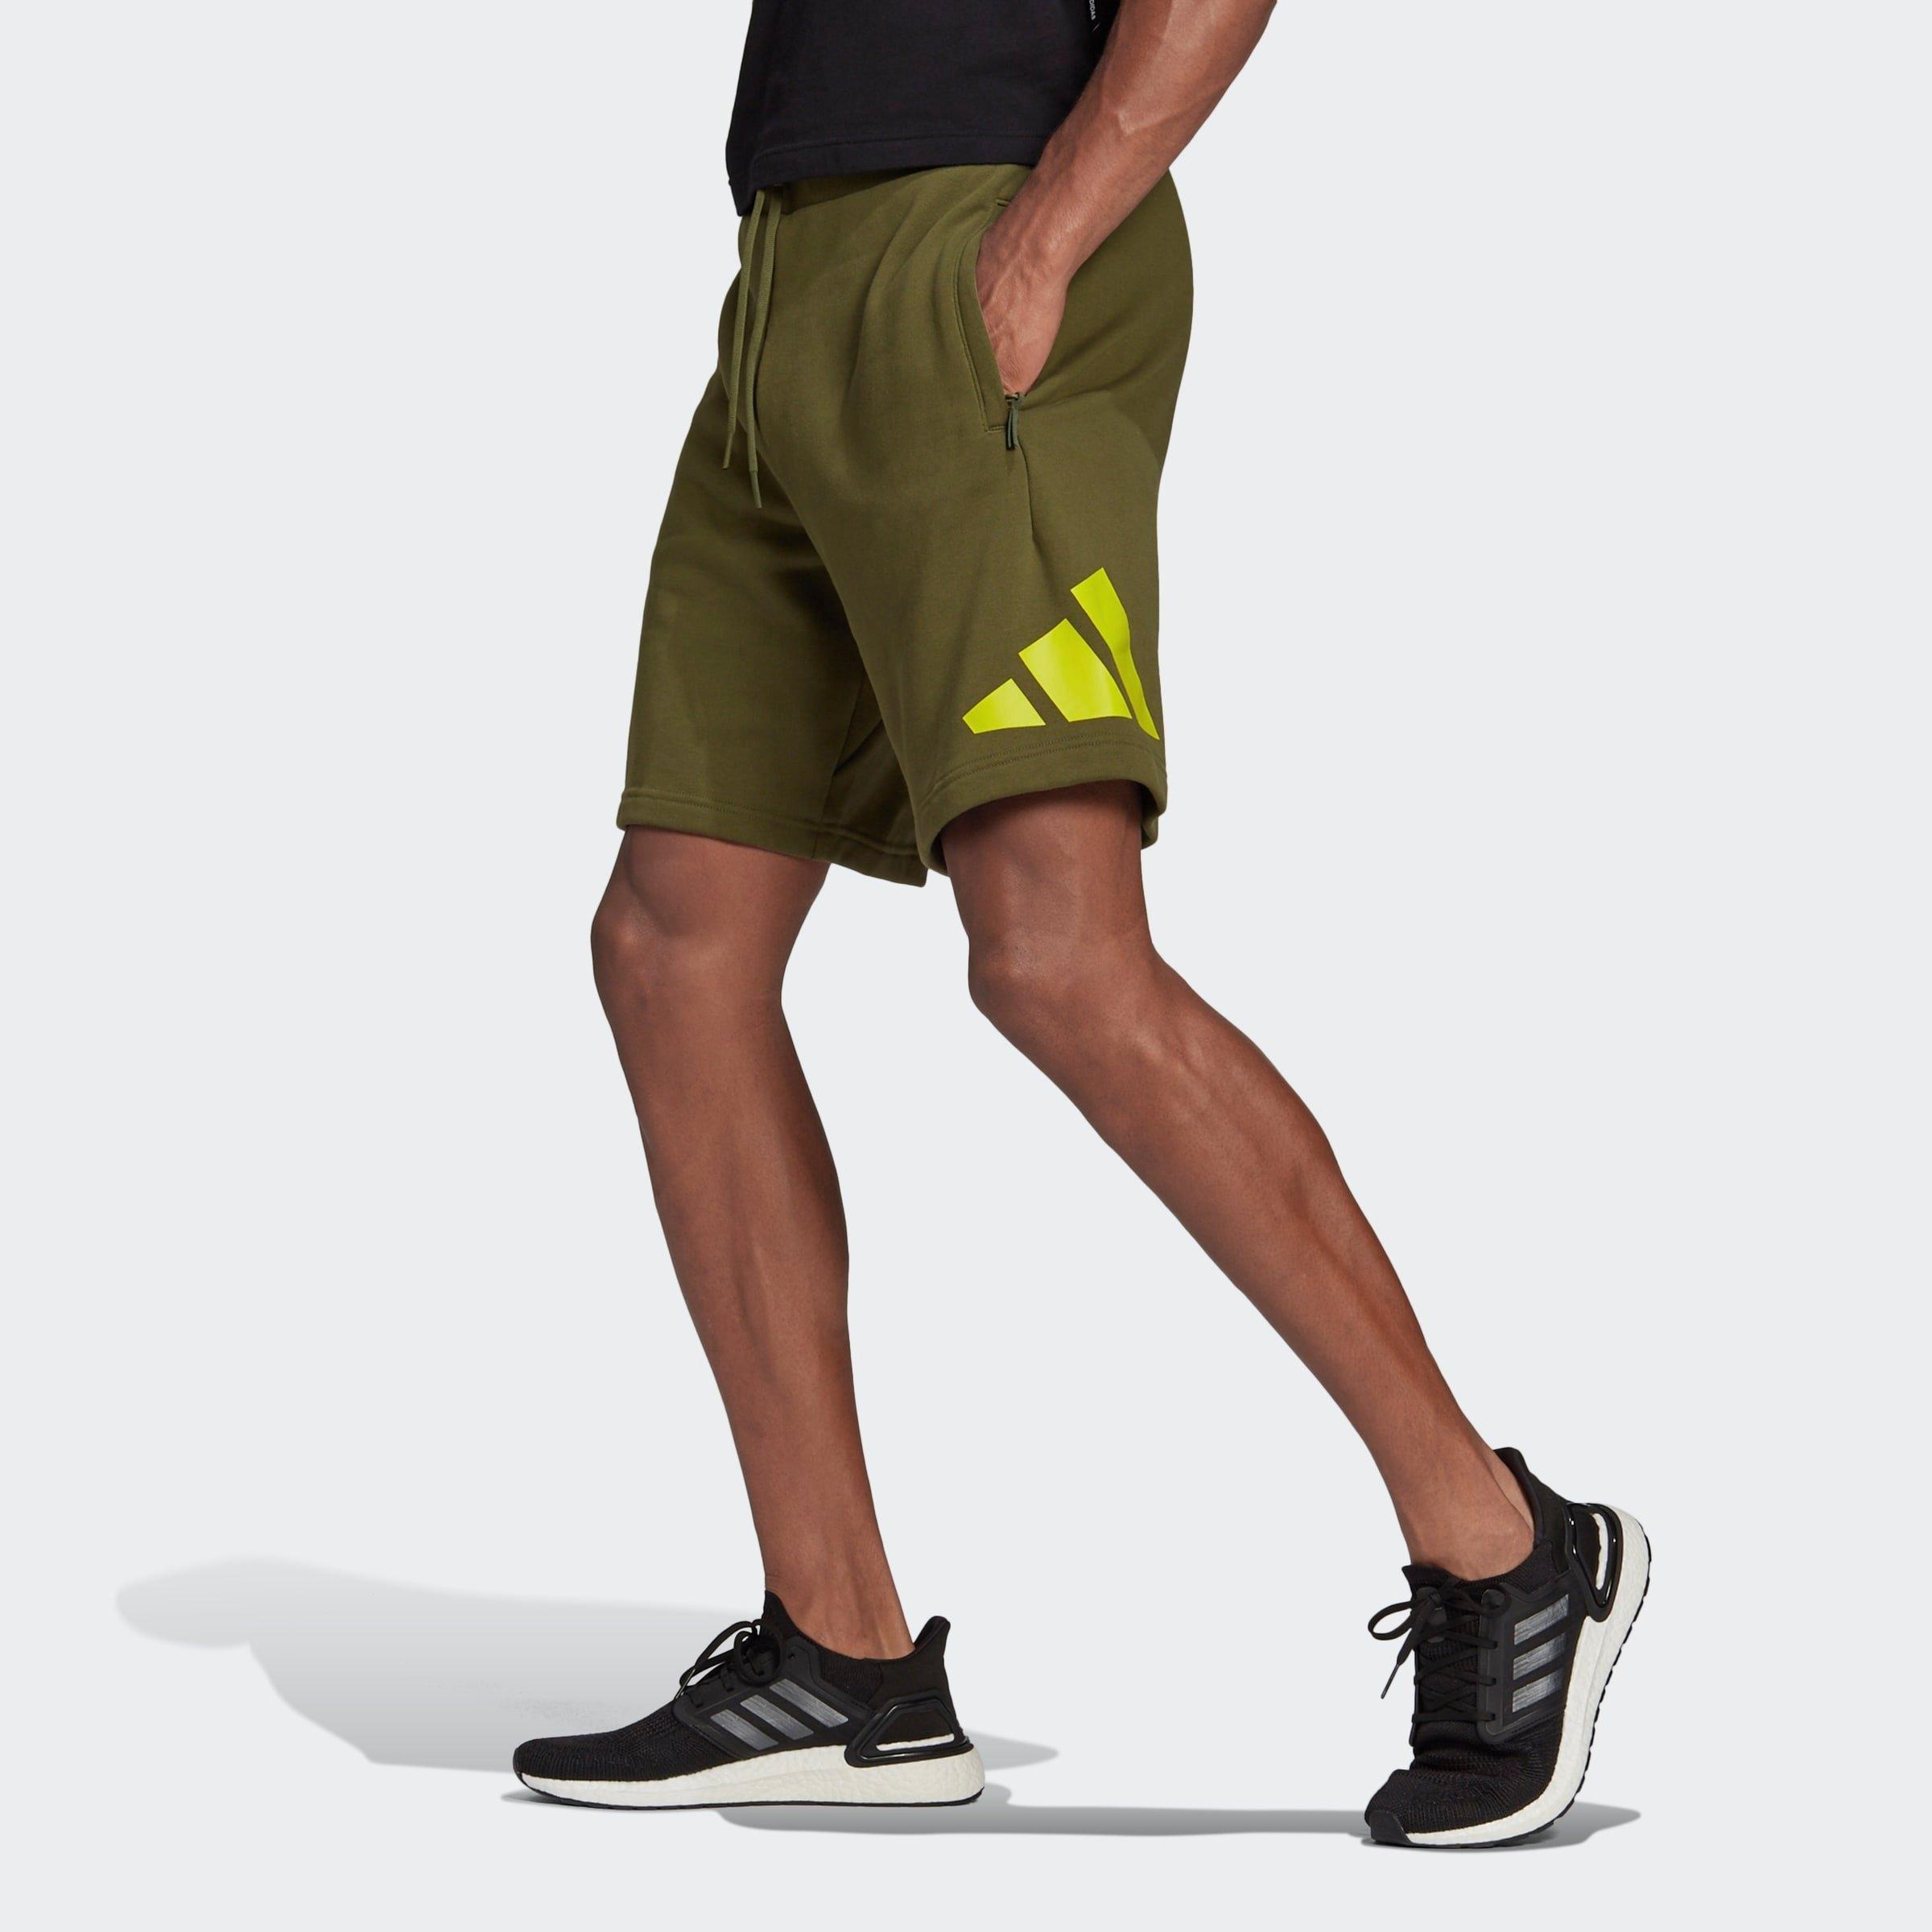 adidas Performance Sweatshort ADIDAS SPORTSWEAR BADGE OF SPORT online kopen op otto.nl